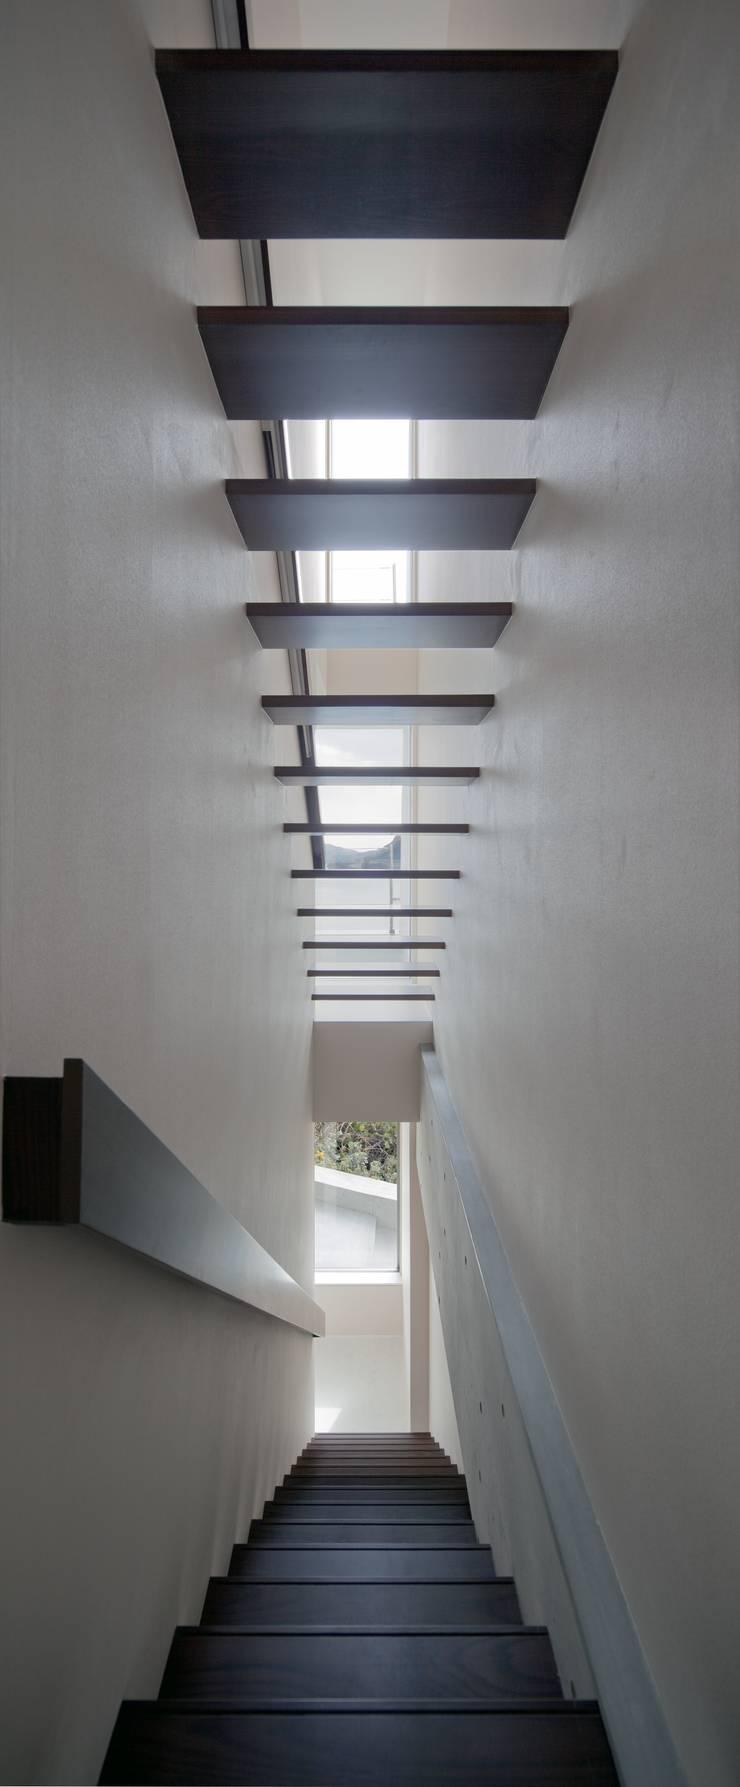 I-house 「水平線の家」: Architect Show co.,Ltdが手掛けたです。